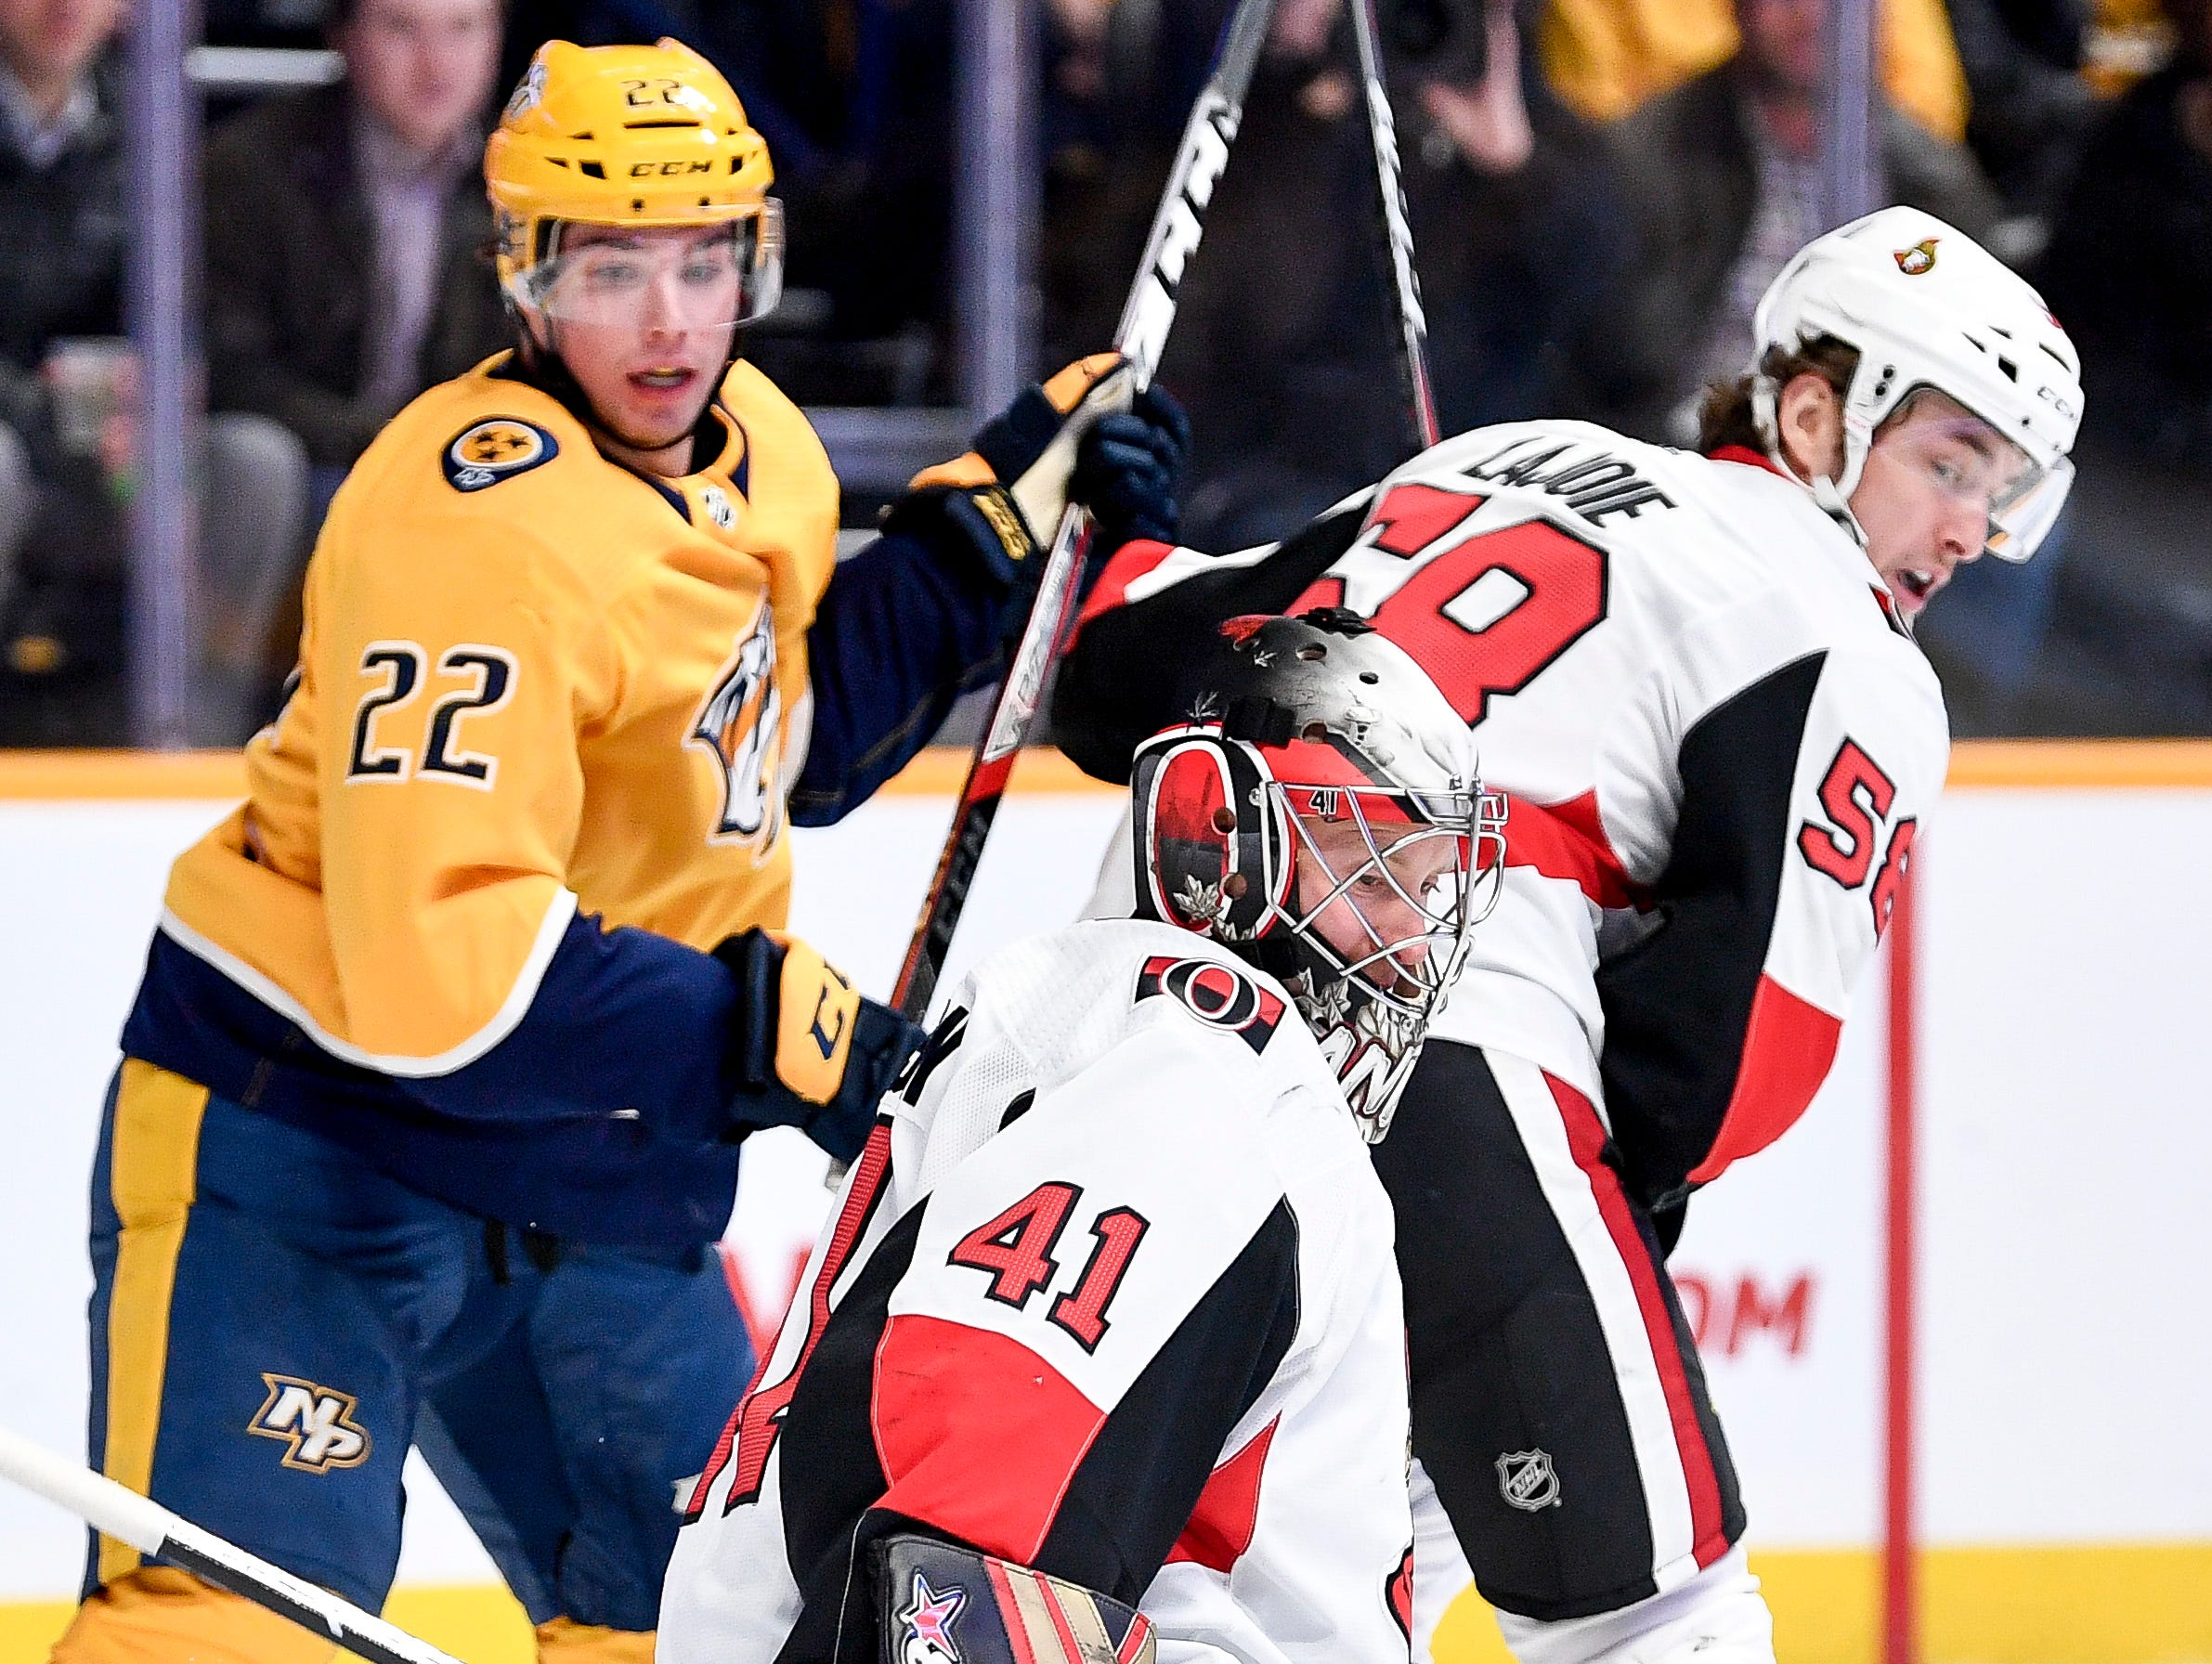 Ottawa Senators goaltender Craig Anderson (41) blocks a shot against the Nashville Predators during the first period at Bridgestone Arena in Nashville, Tenn., Tuesday, Dec. 11, 2018.